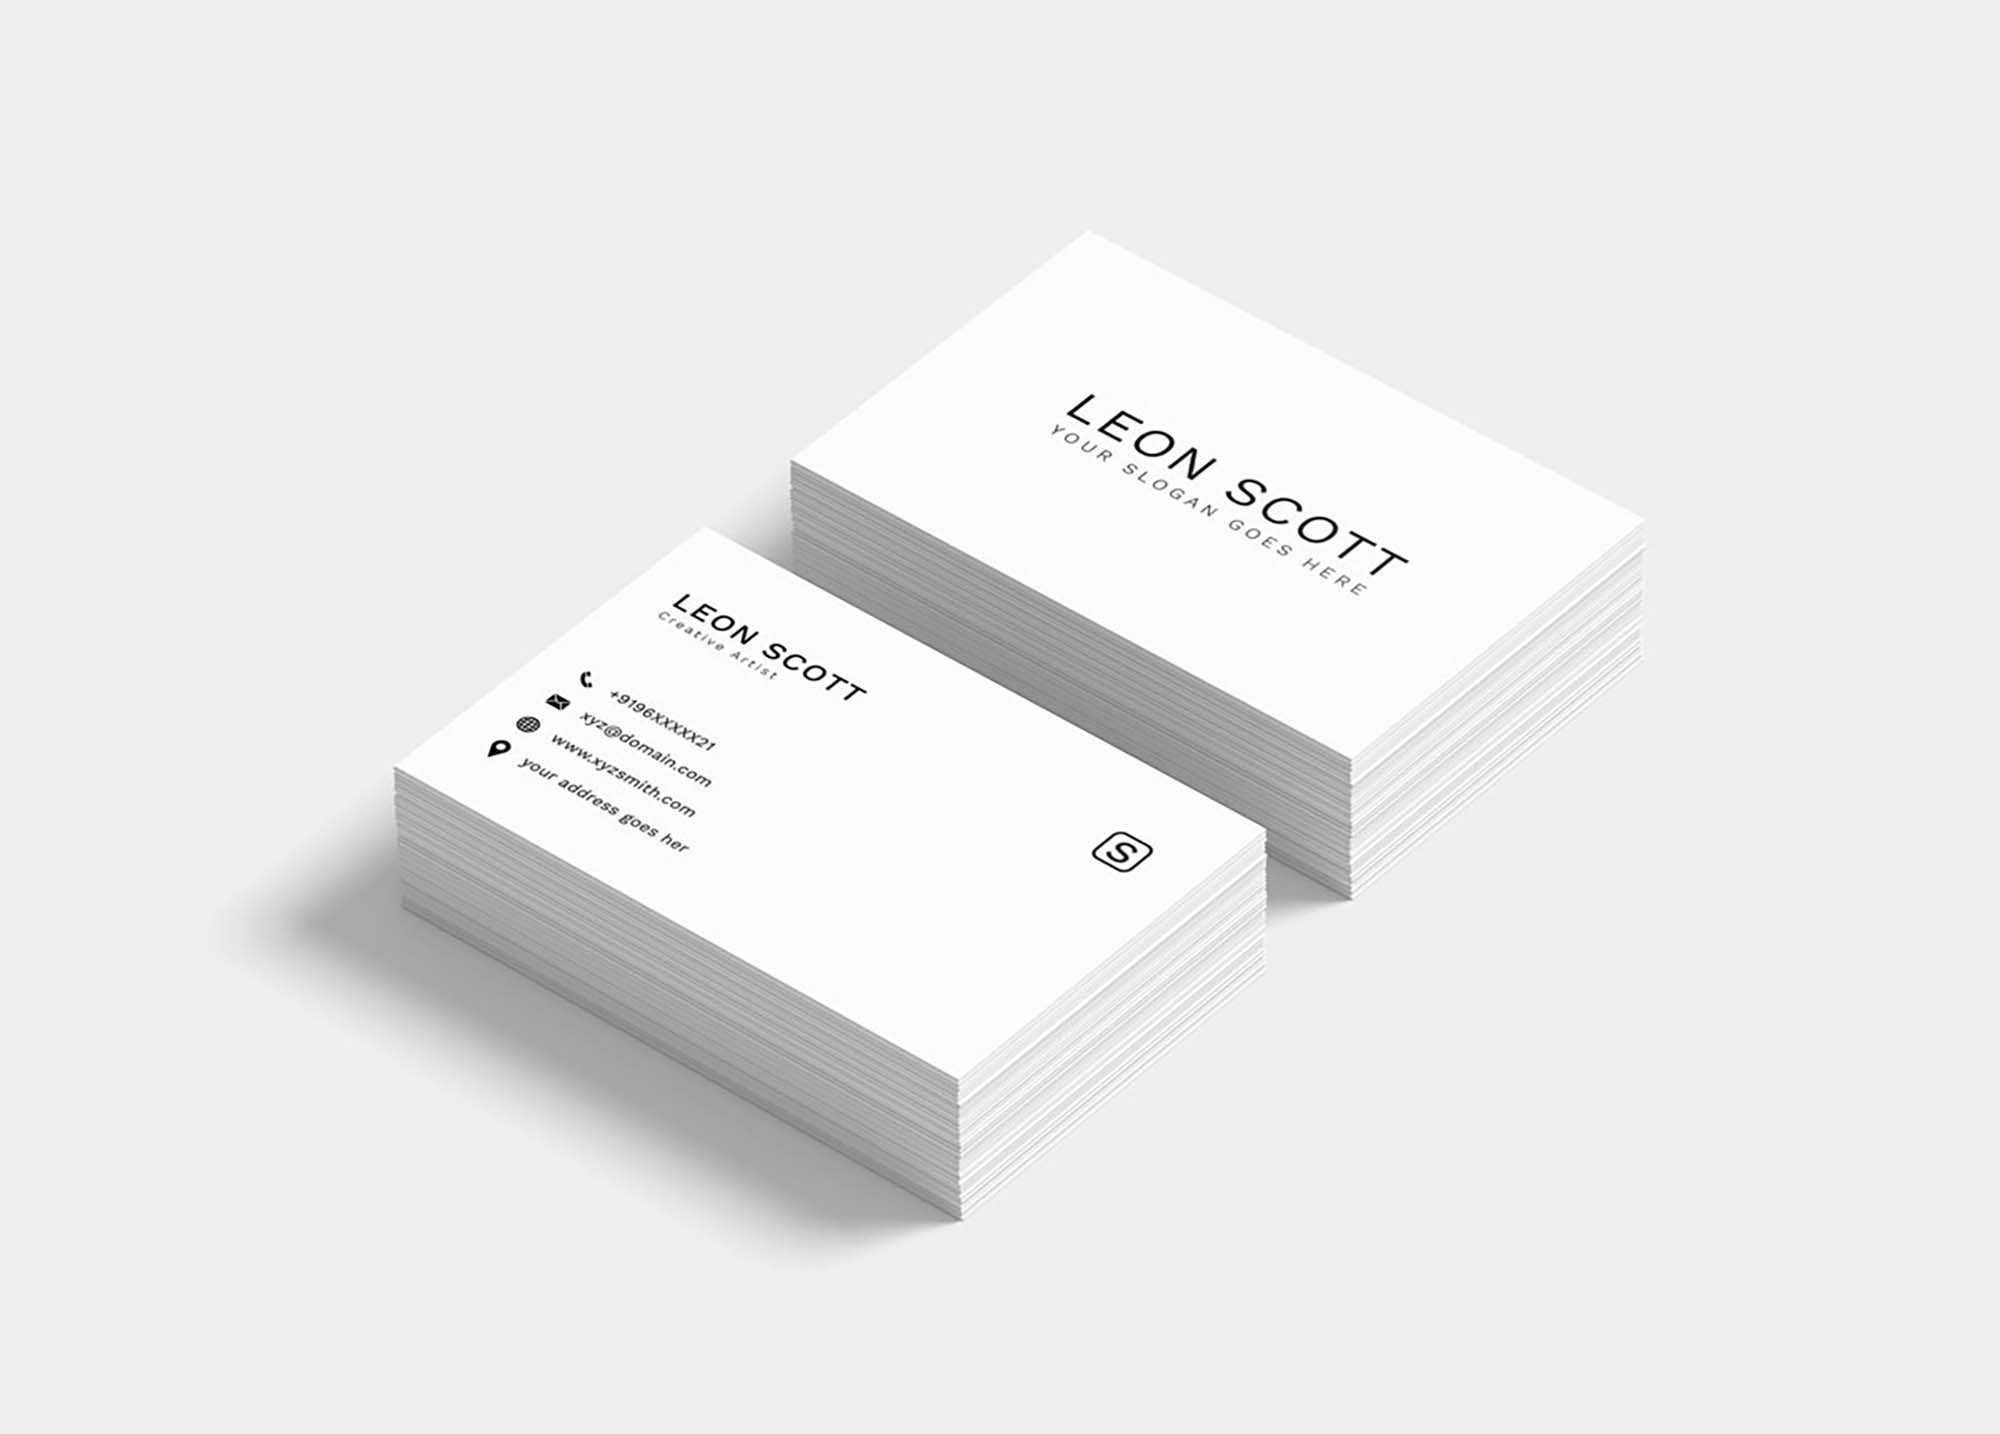 Free Minimal Elegant Business Card Template (Psd) Inside Name Card Template Photoshop